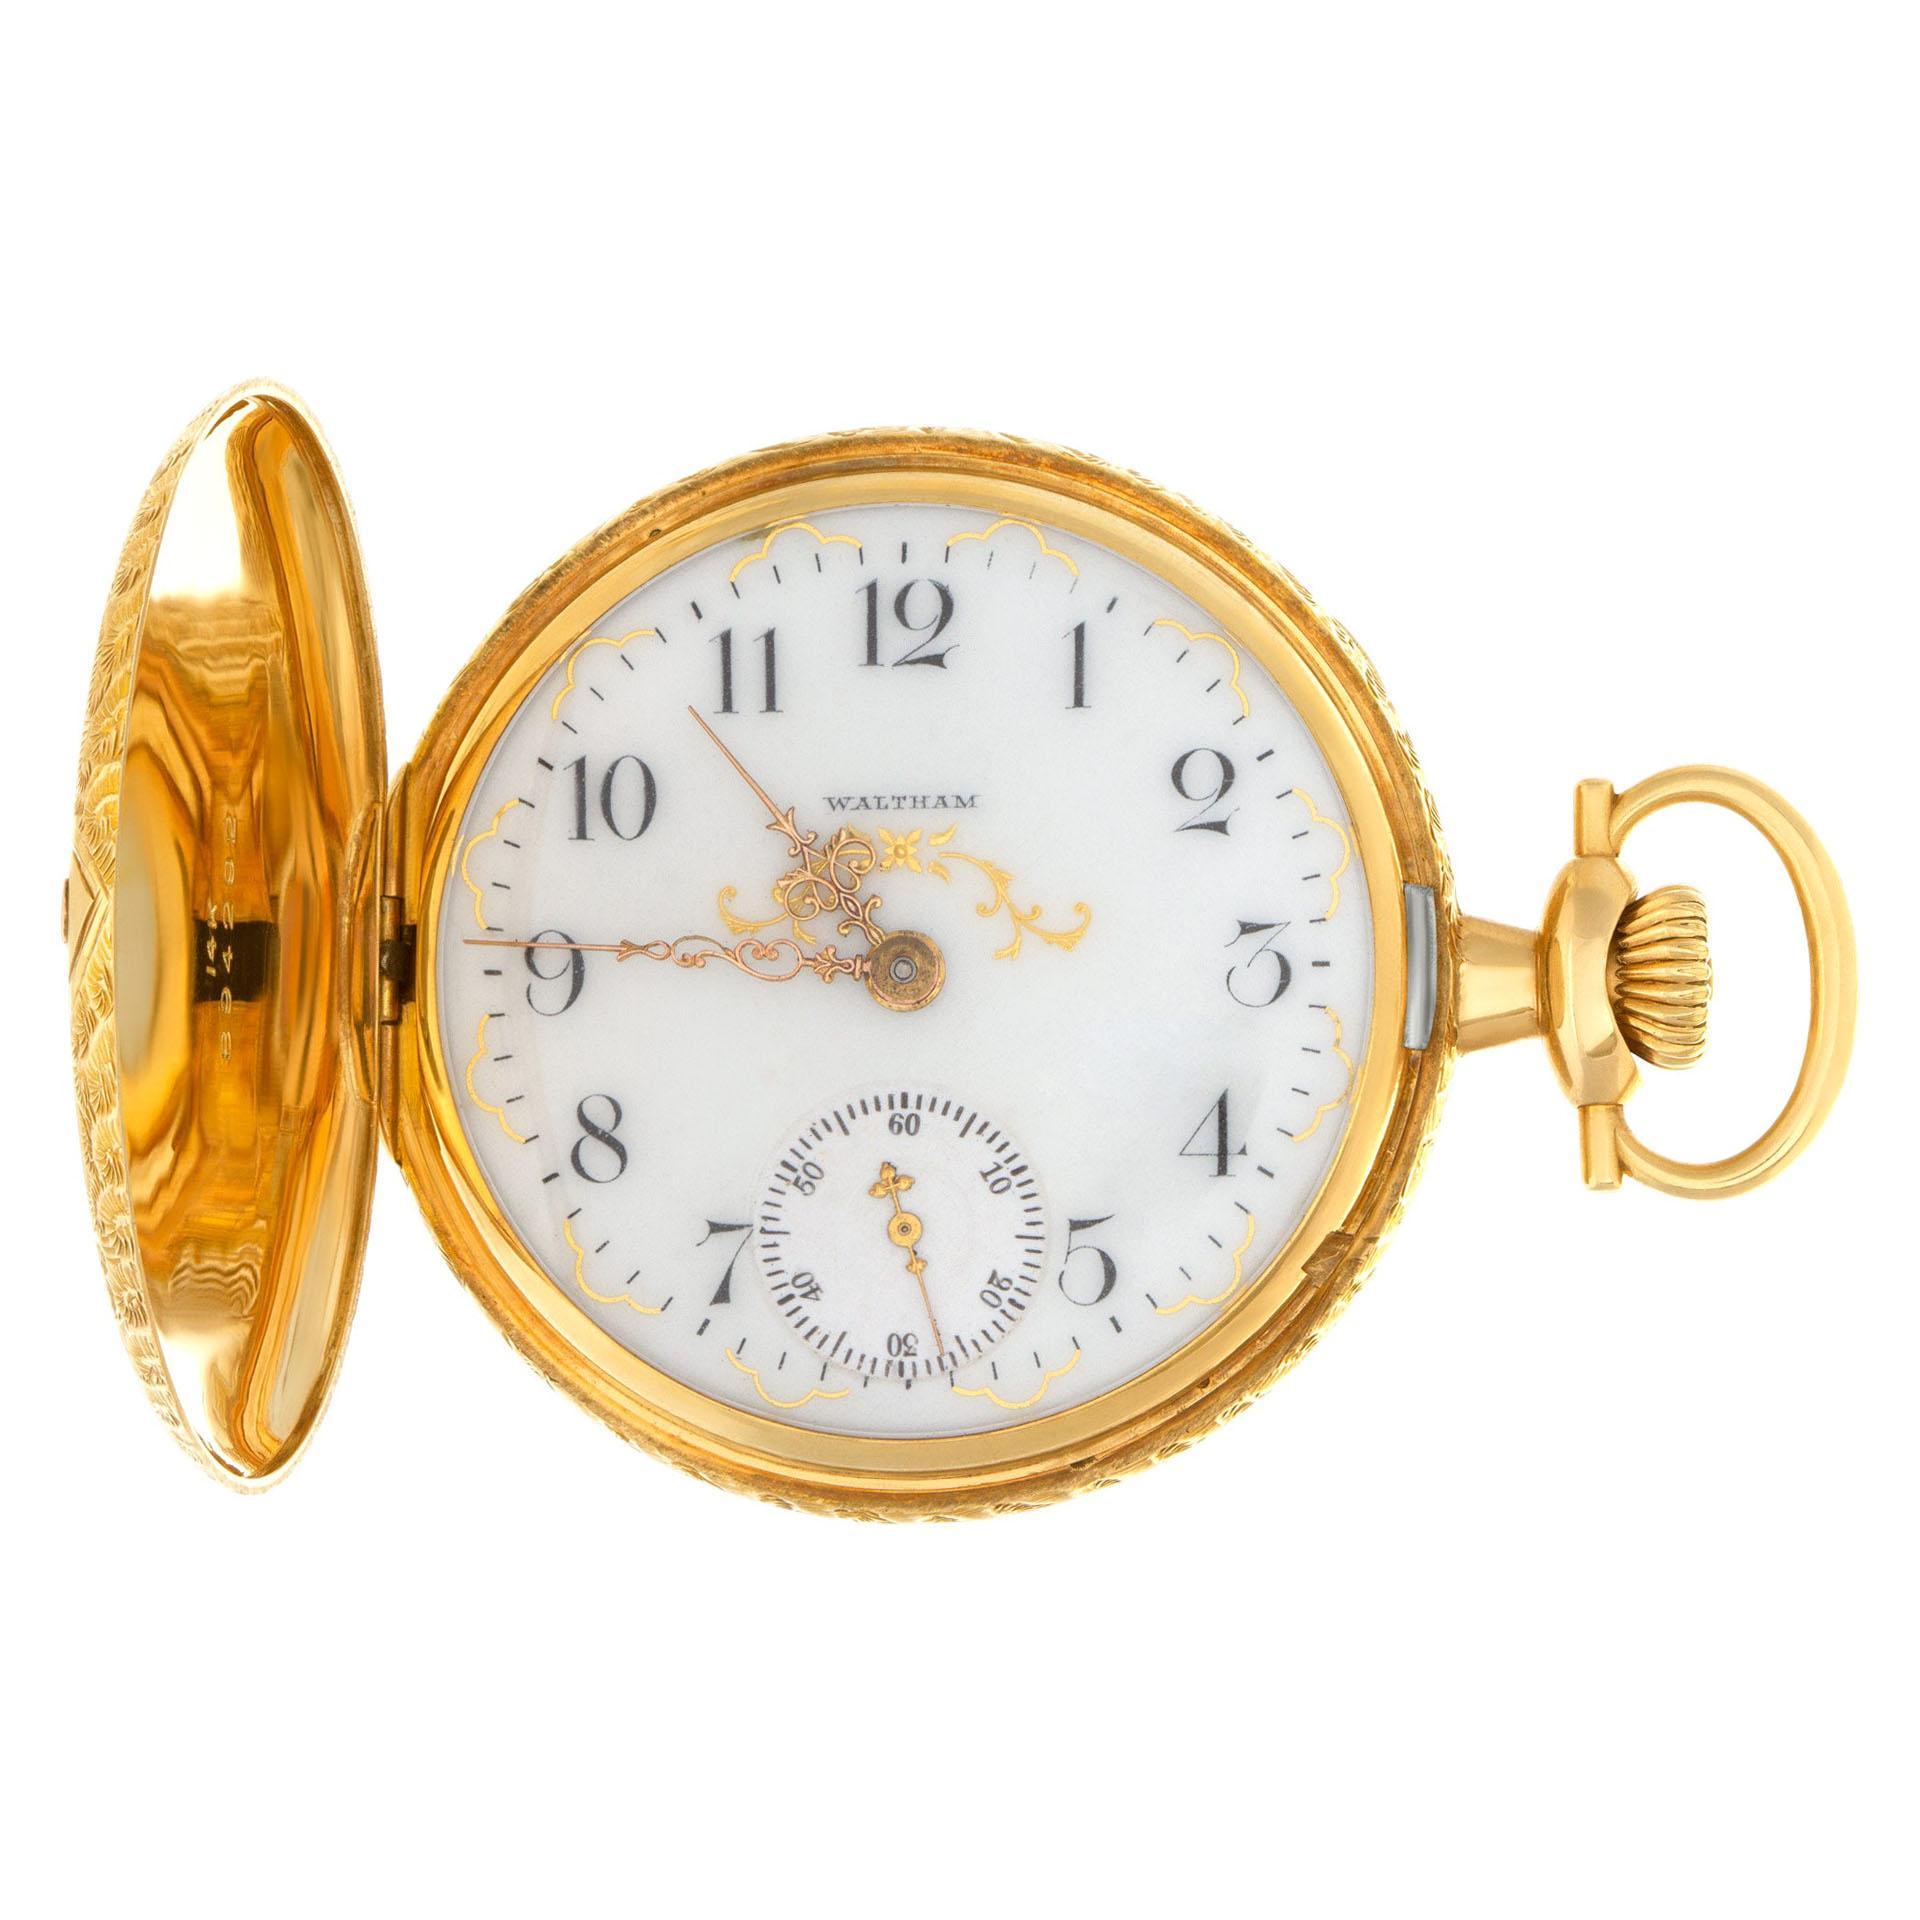 Waltham Wadsworth Pocketwatch in 14k White Porcelain Dial